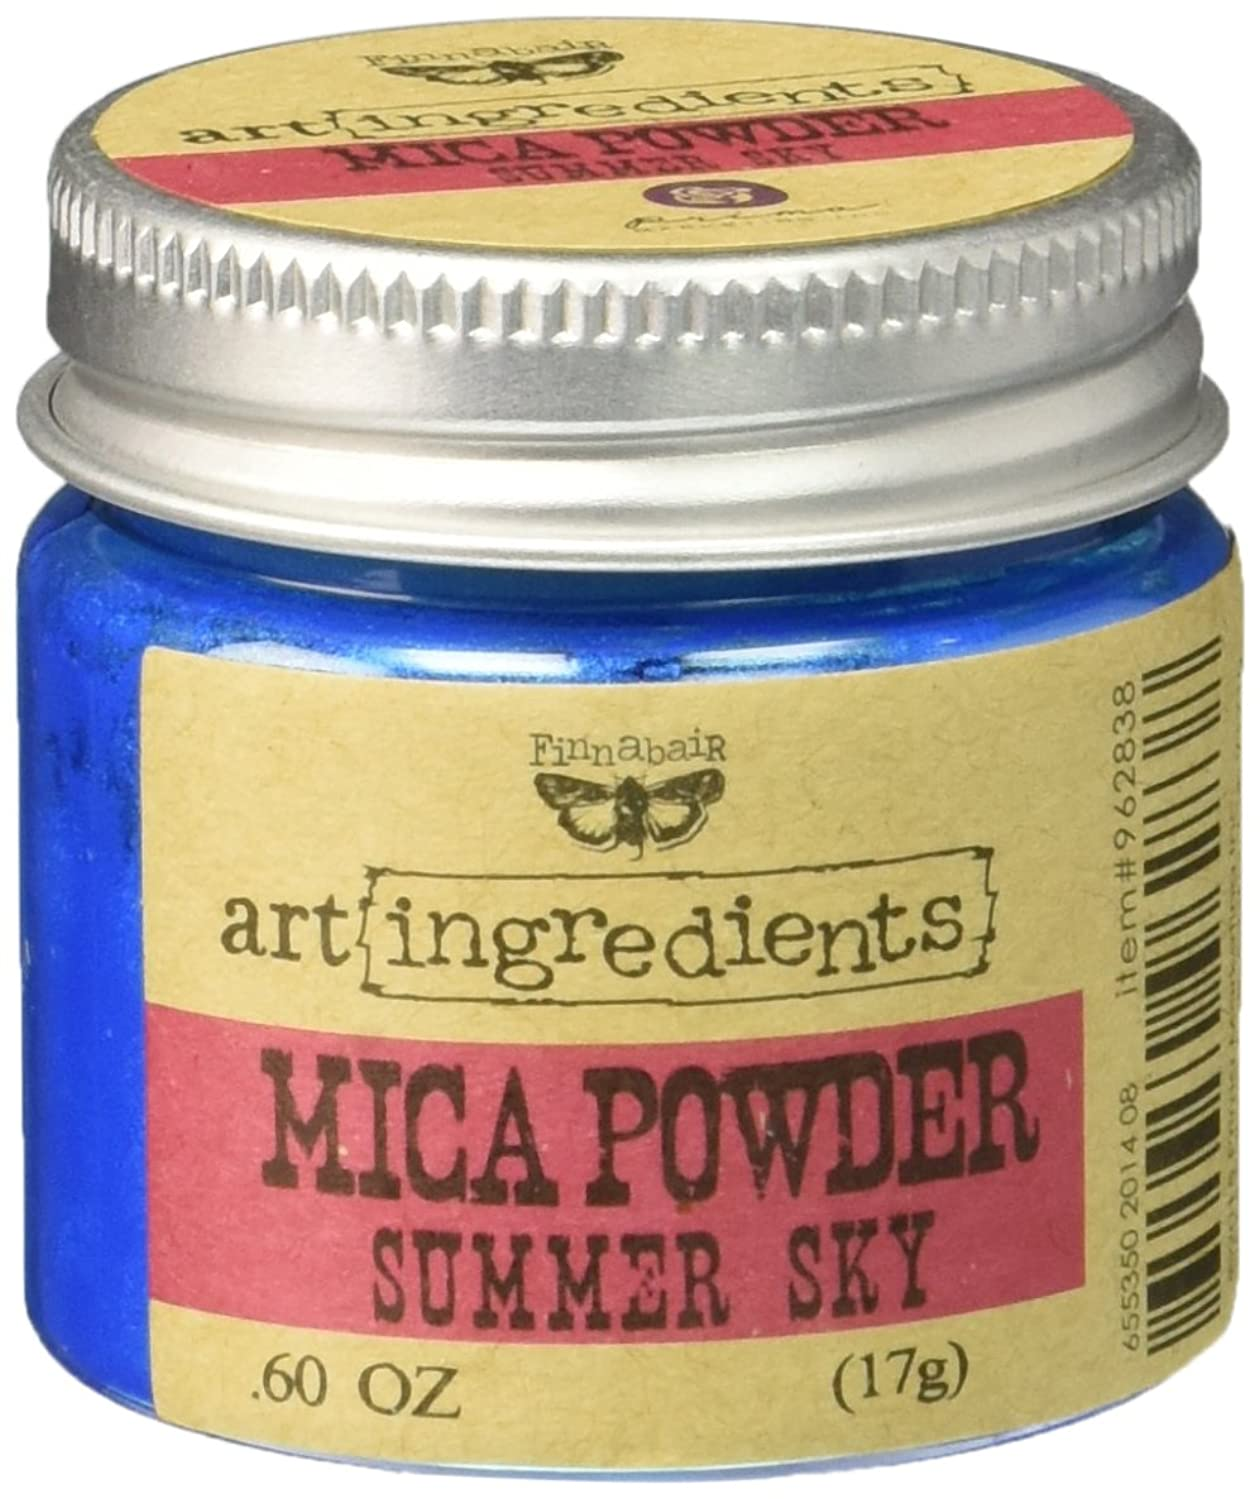 Prima Marketing 962838 Finnabair Art Ingredients Mica Powder, 0.6 oz, Summer Sky